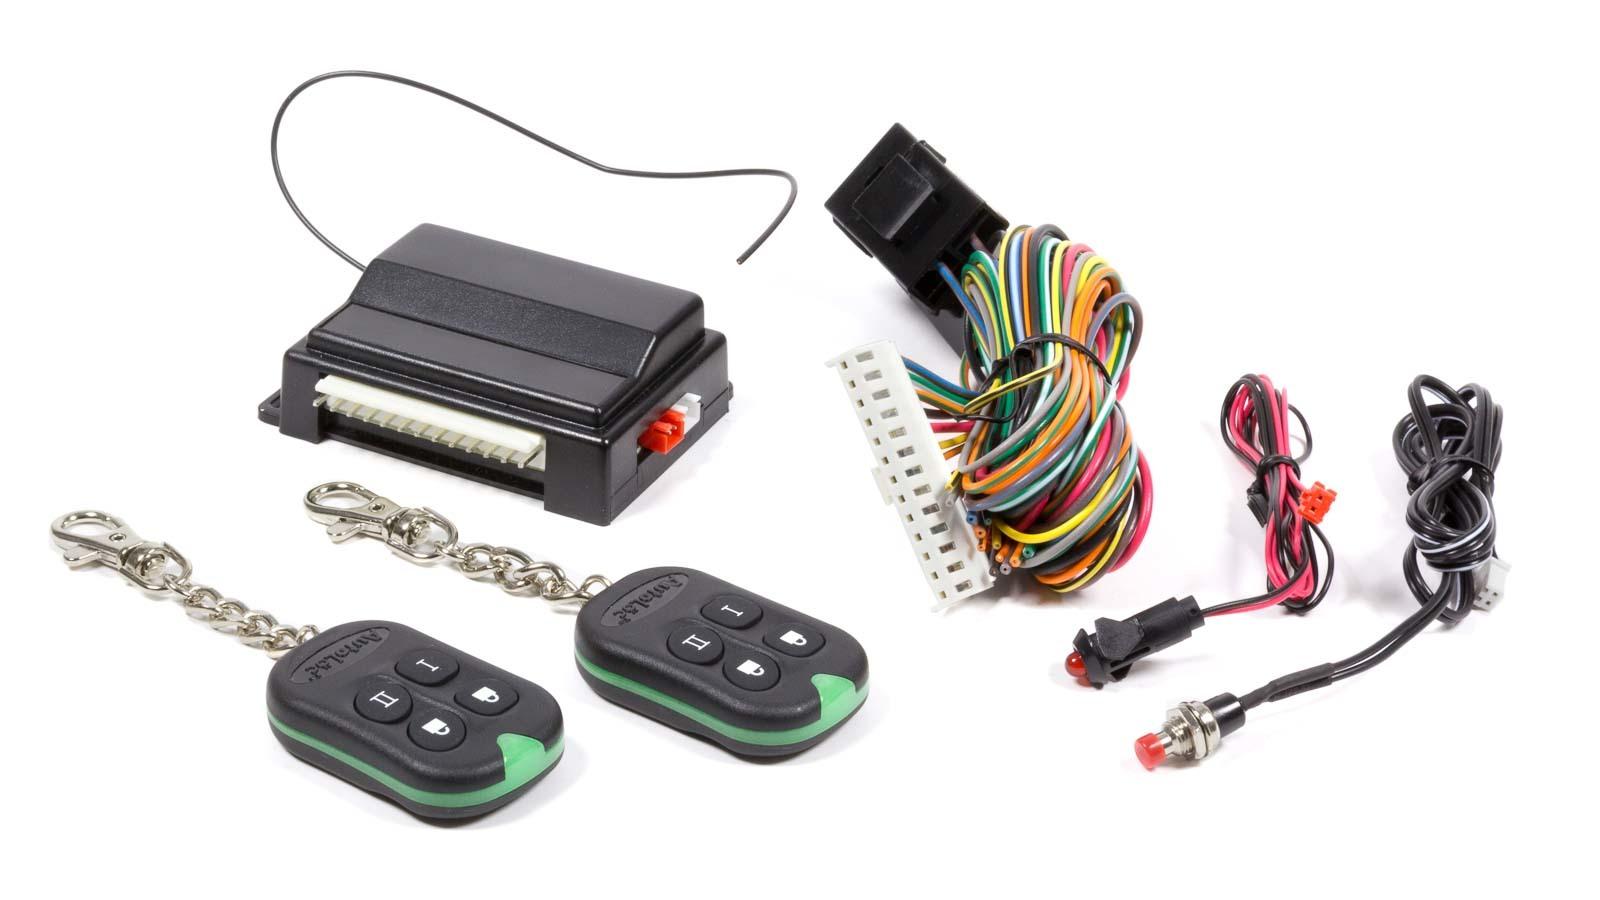 Auto-loc 5 Function Keyless Entry System